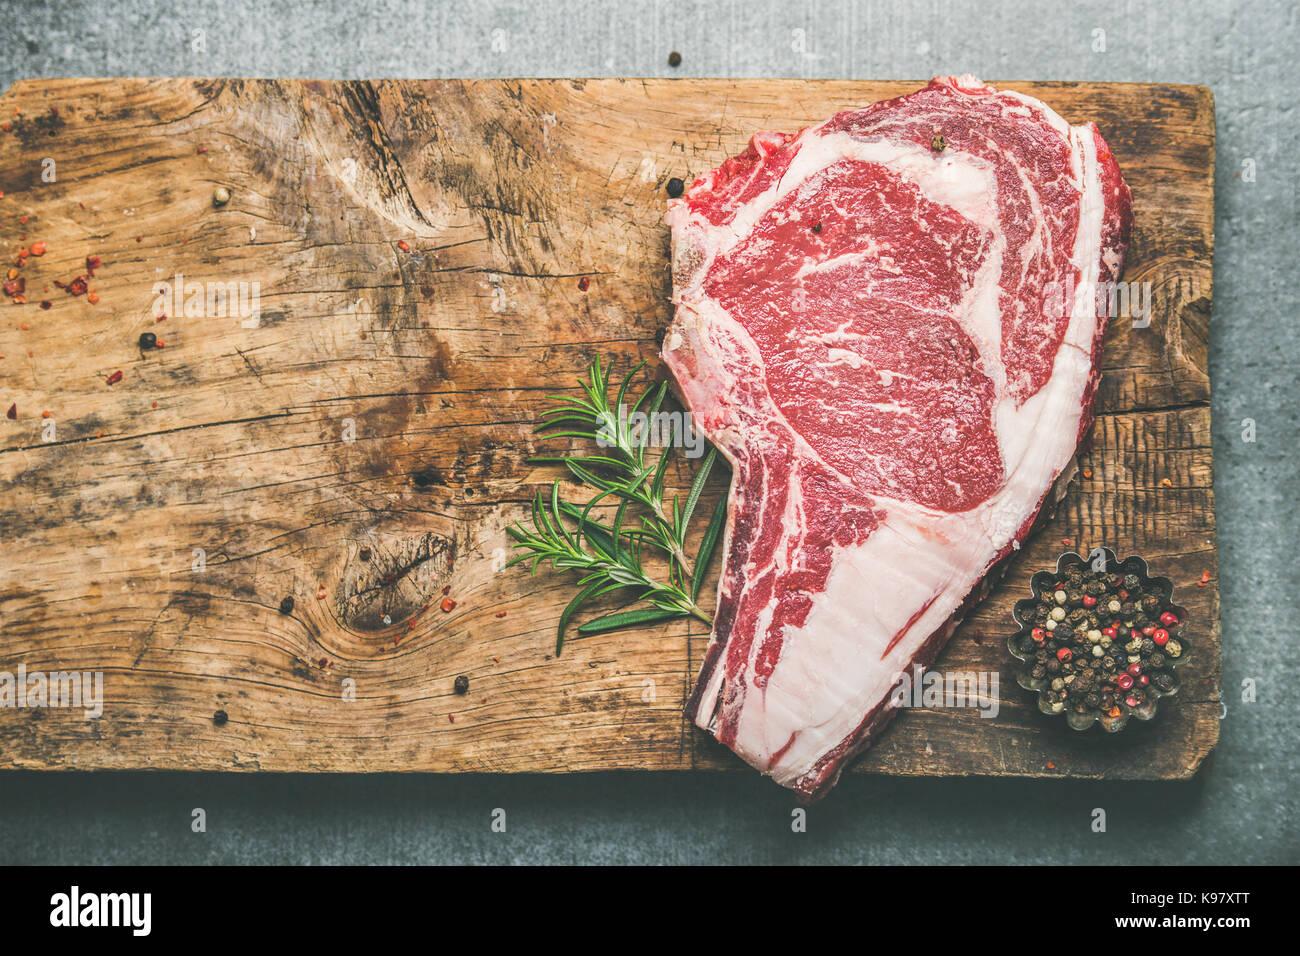 Raw uncooked beef steak rib-eye on board, copy space - Stock Image